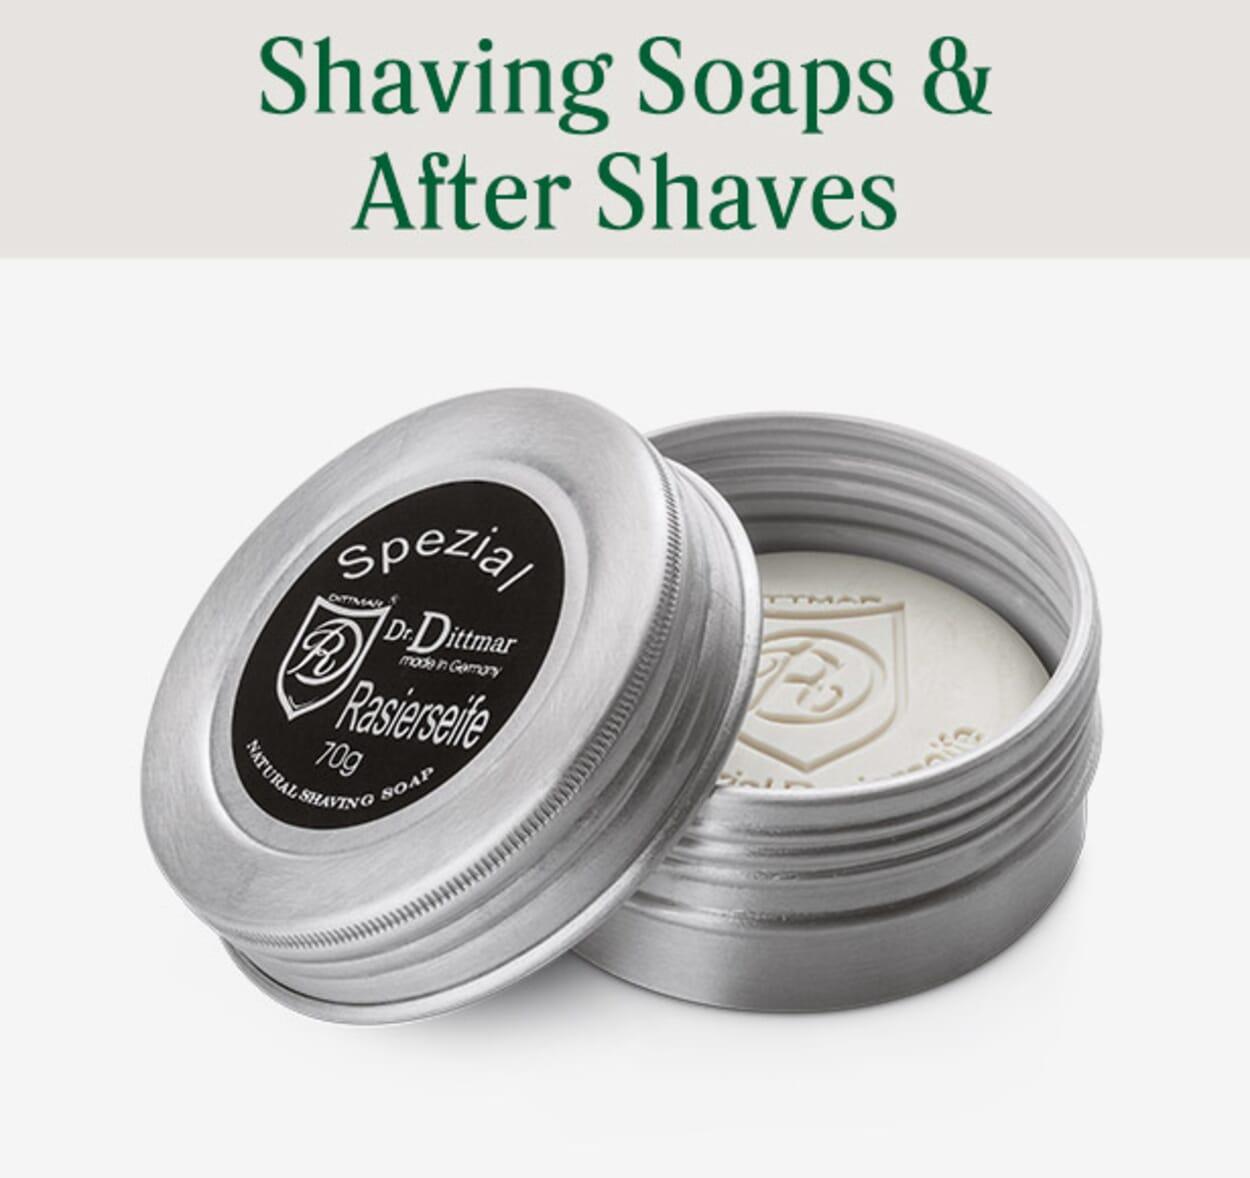 Shaving Soaps & After Shaves